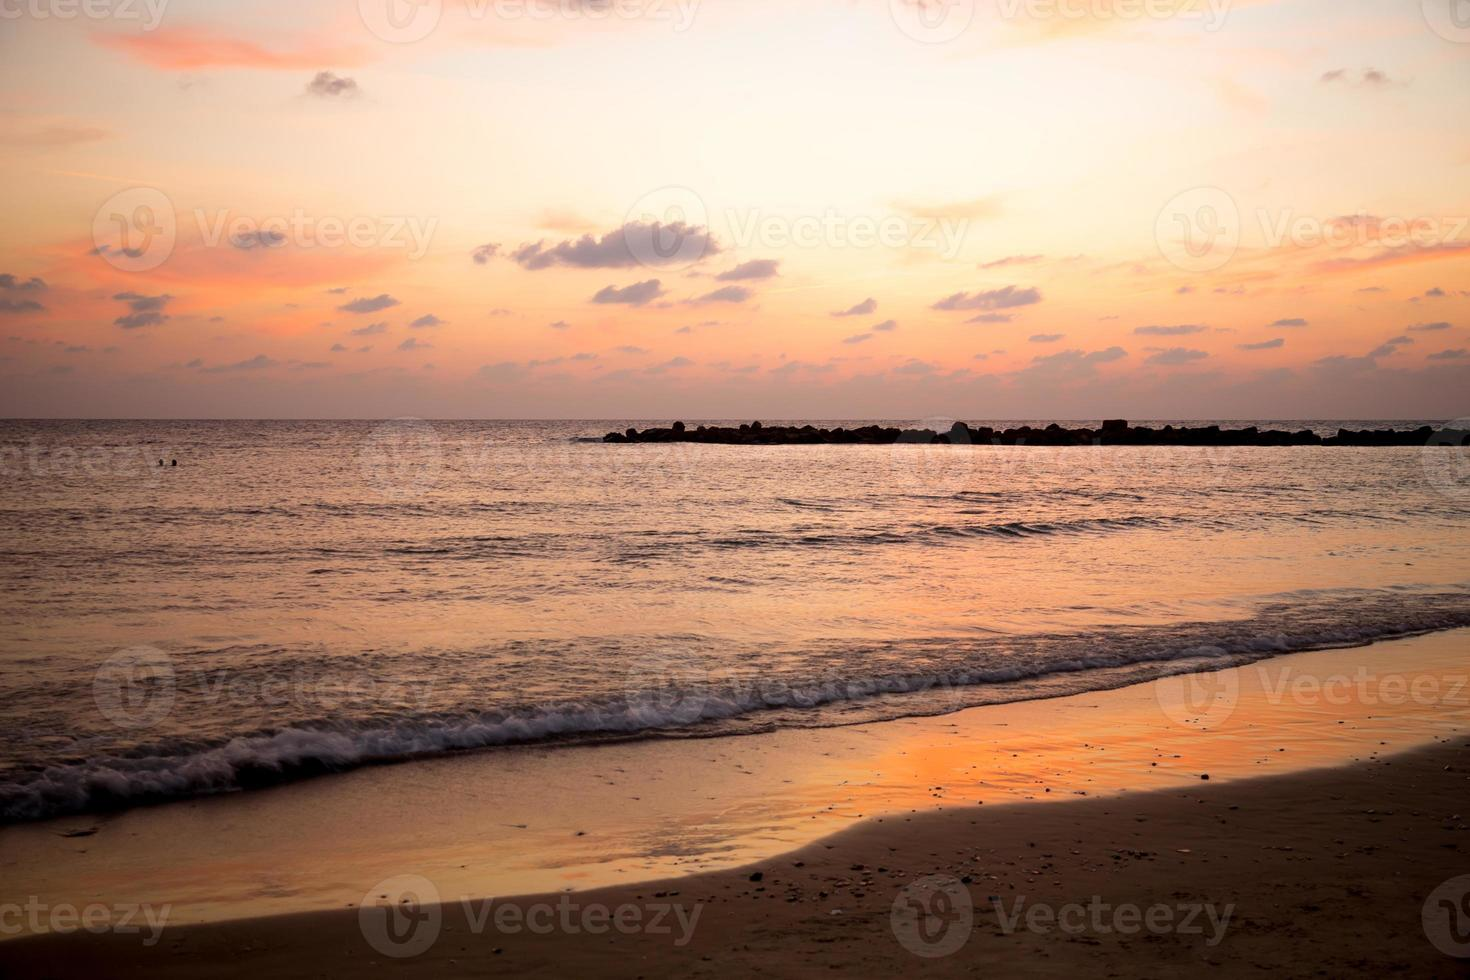 Sunset at a beach photo